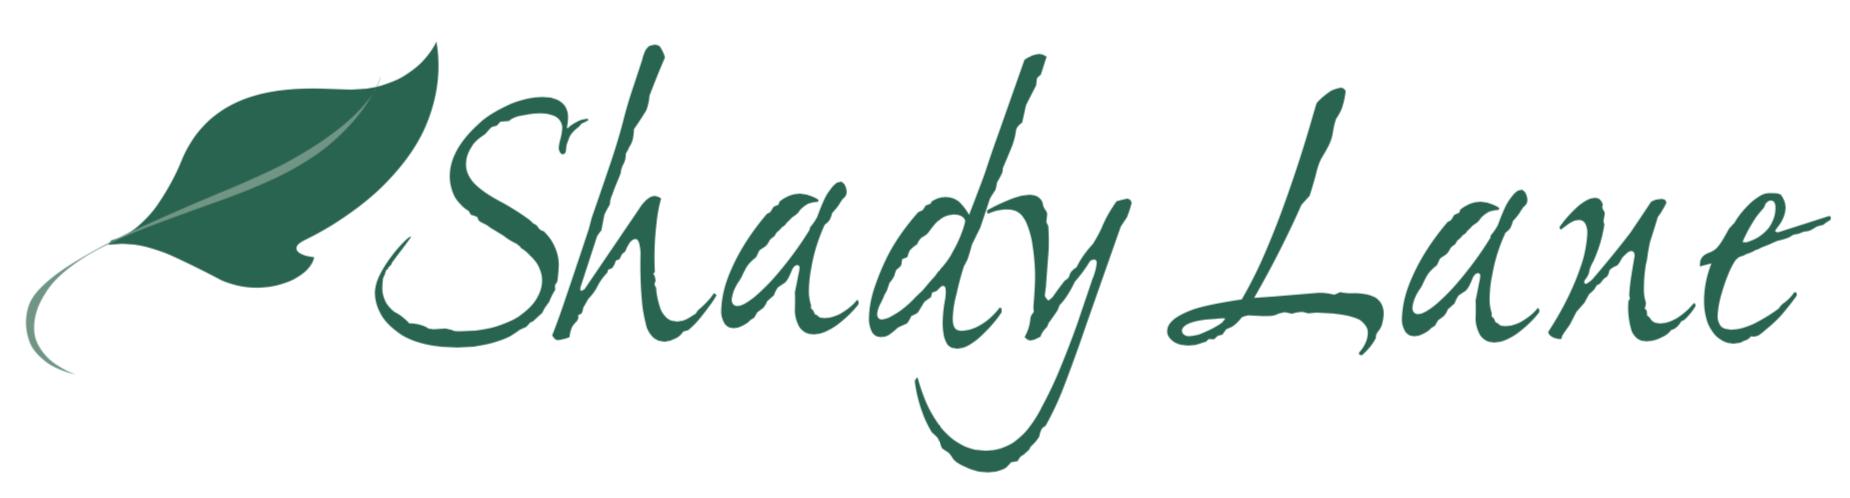 Shady Lane